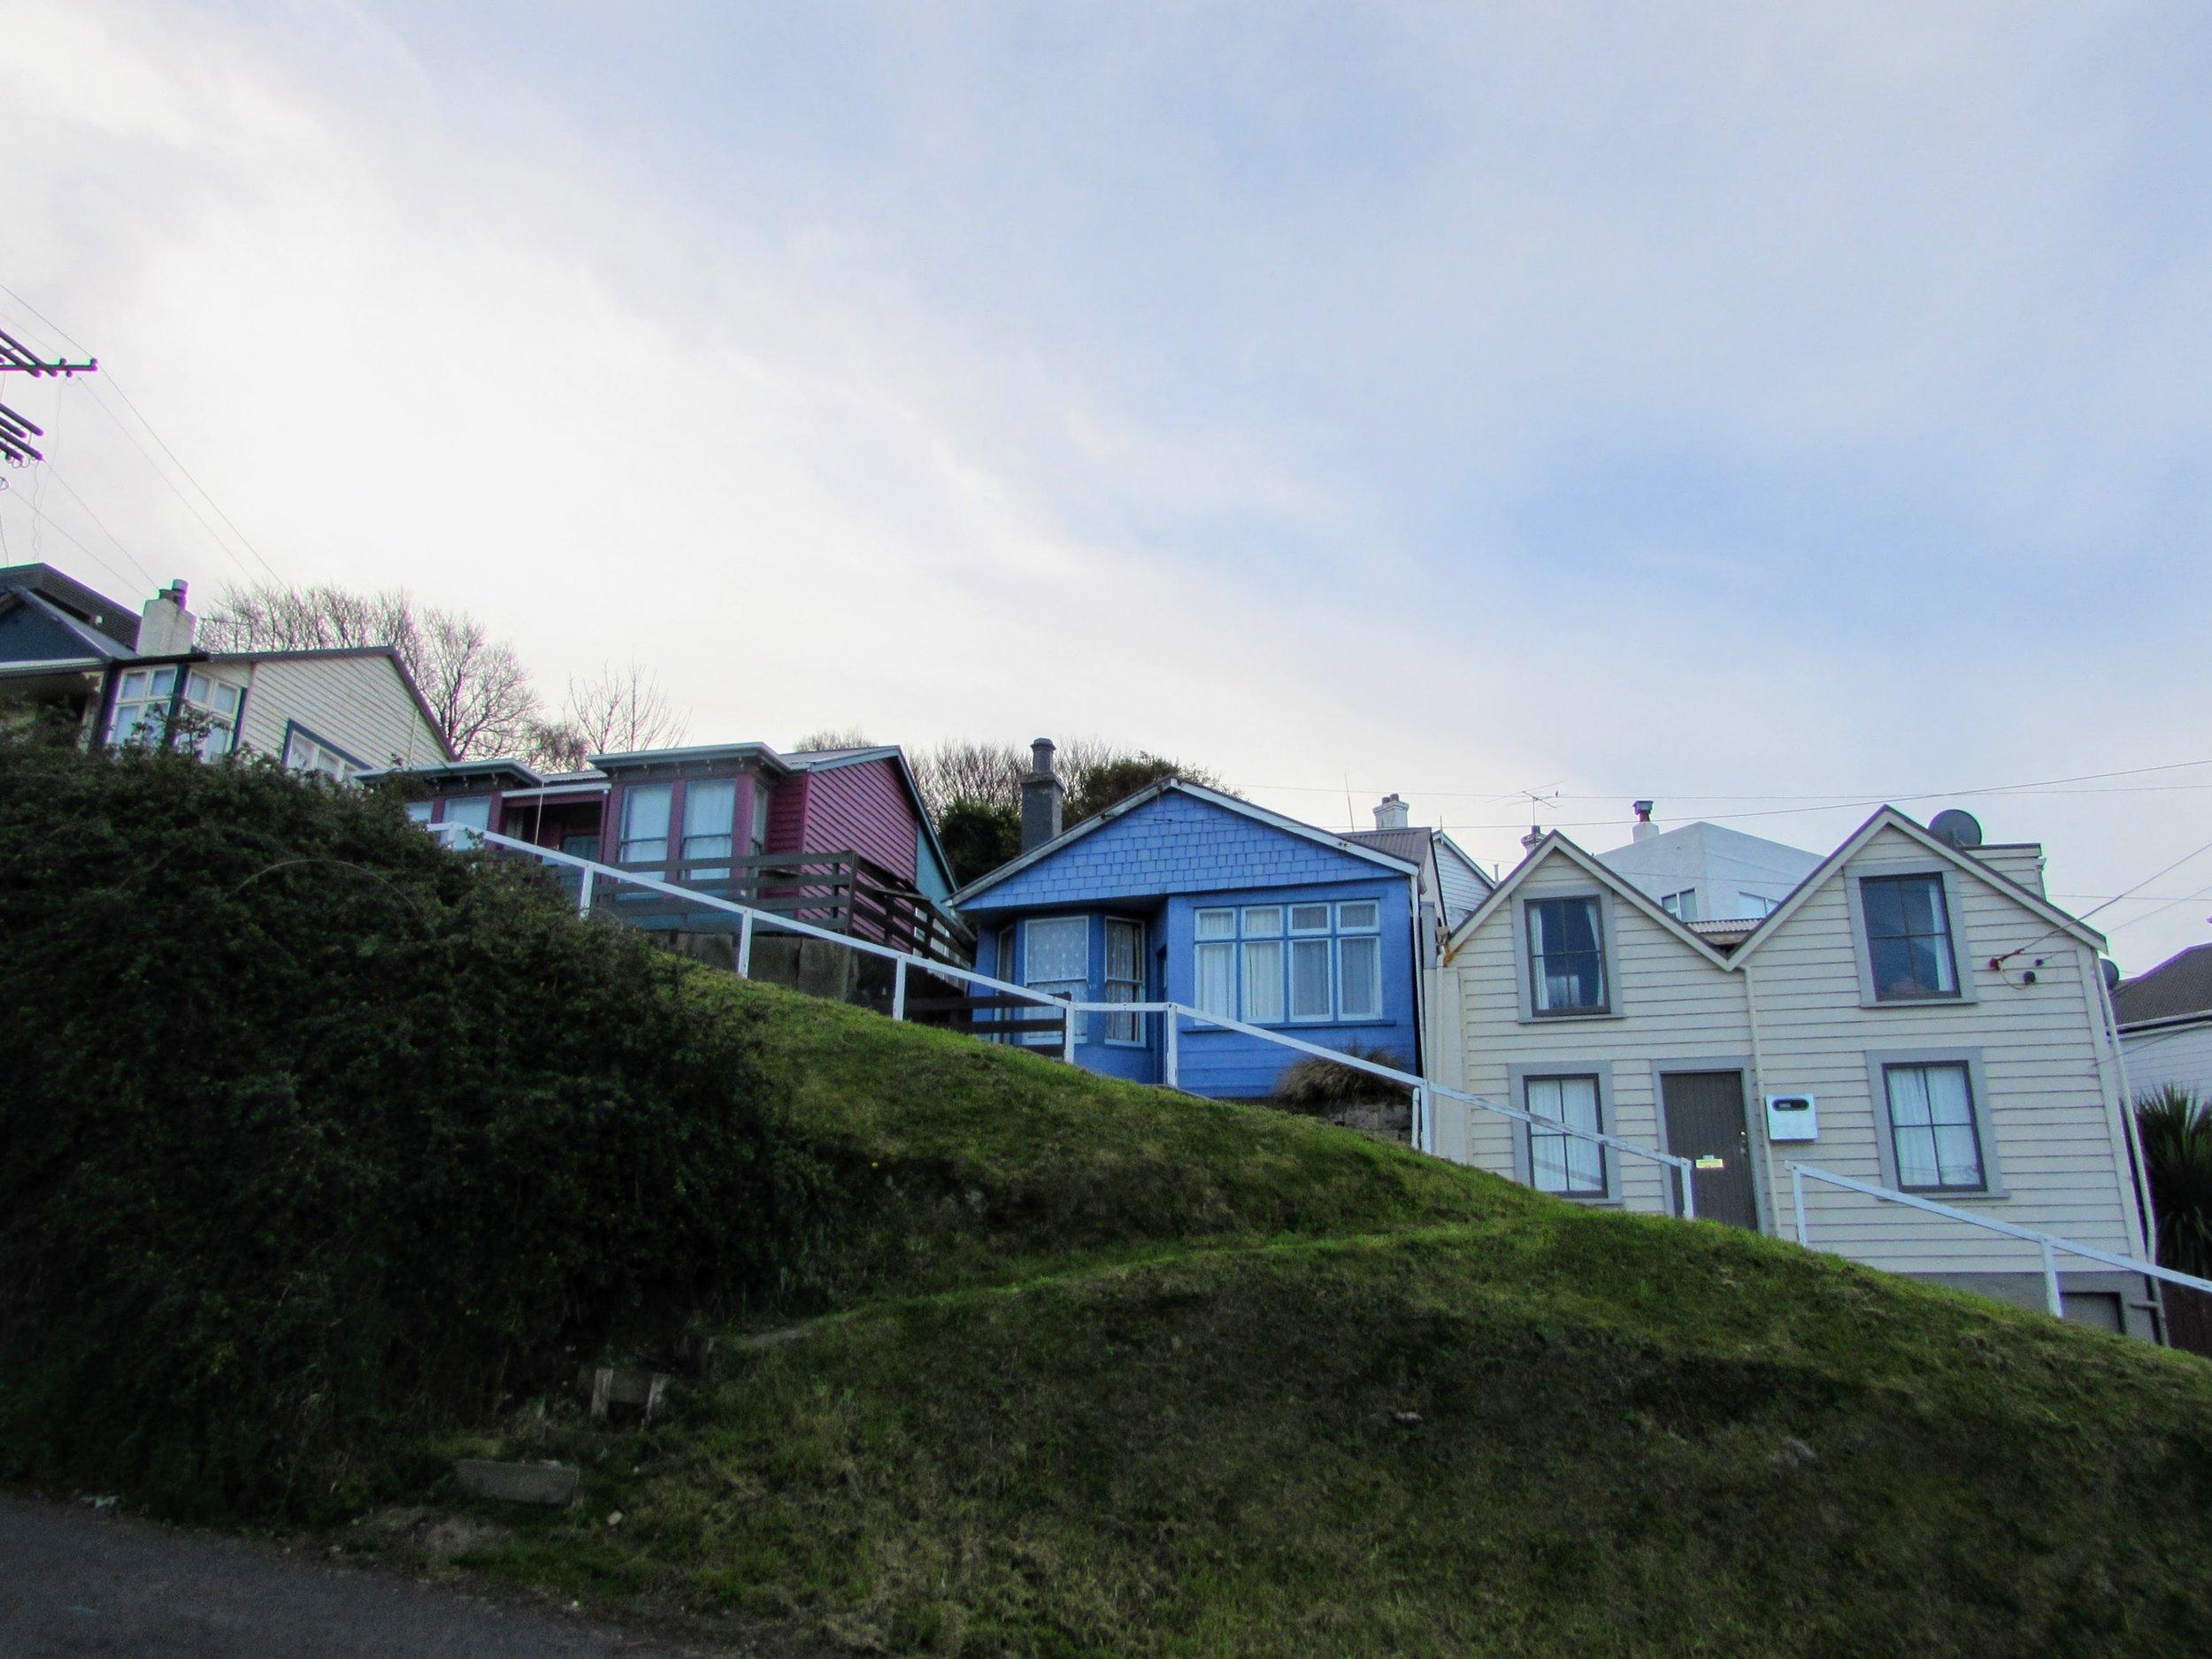 Homes on a steep hill in Dunedin, NZ